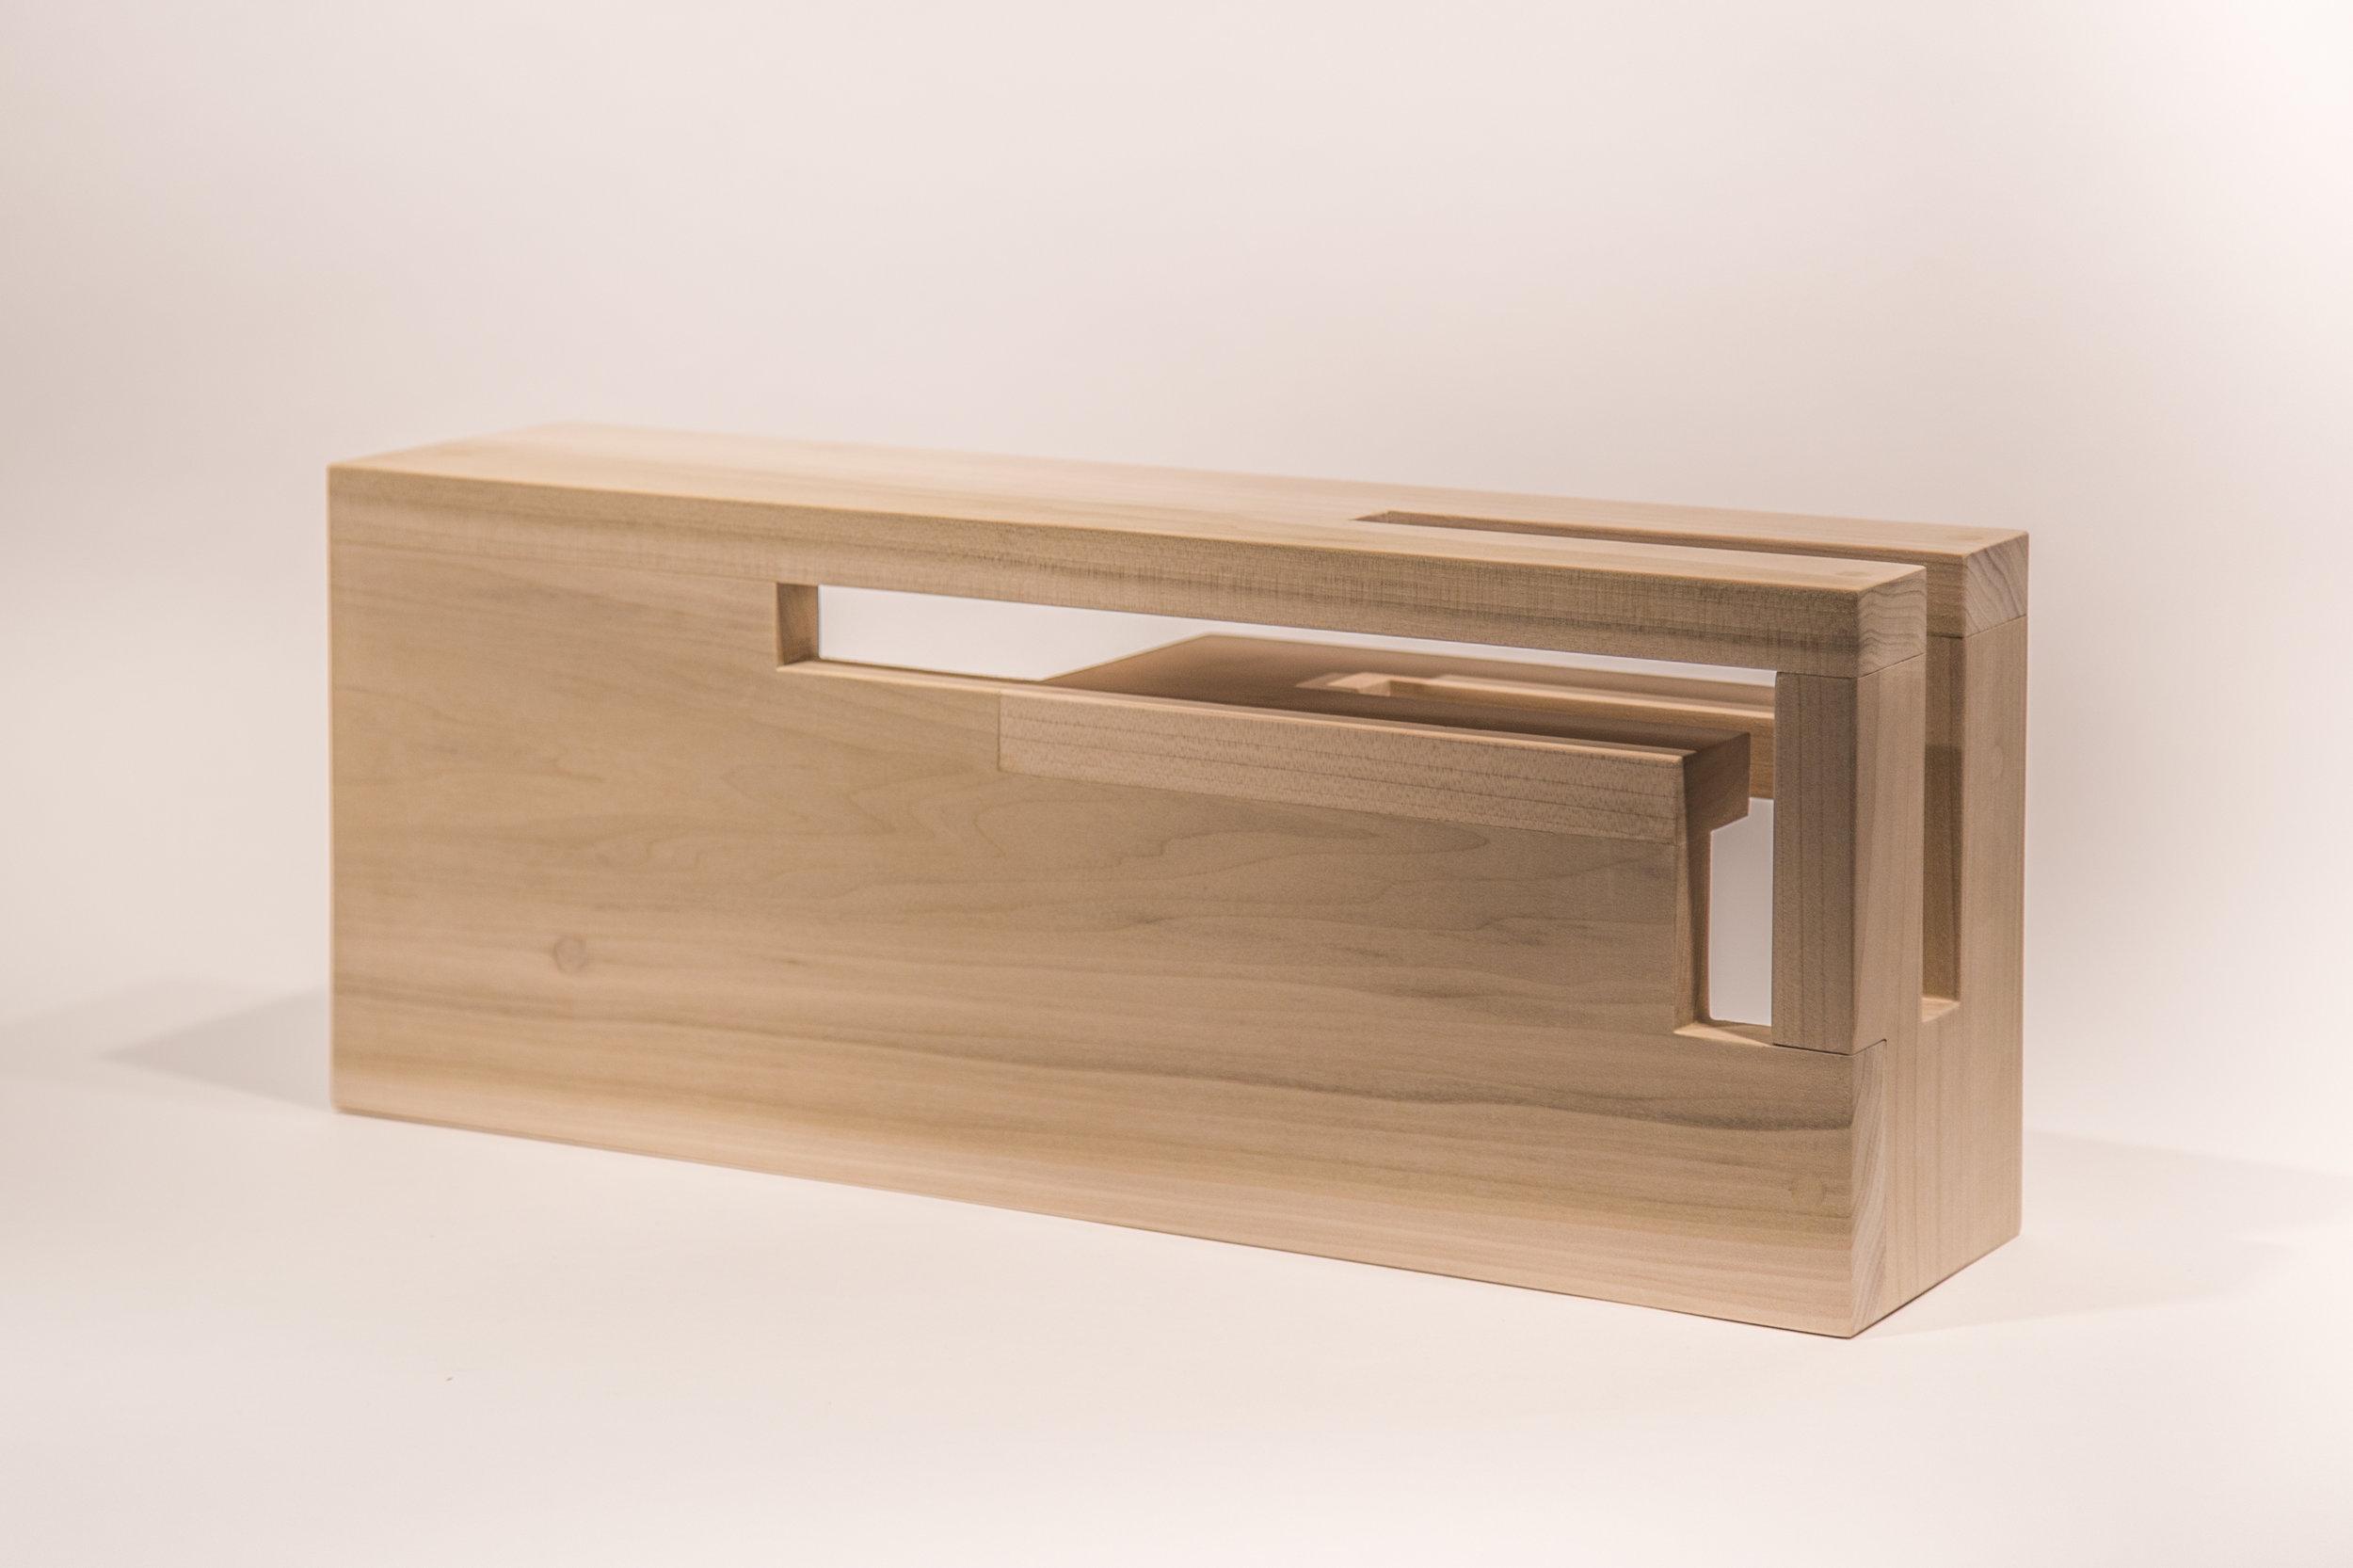 1_Tableshelf.jpg